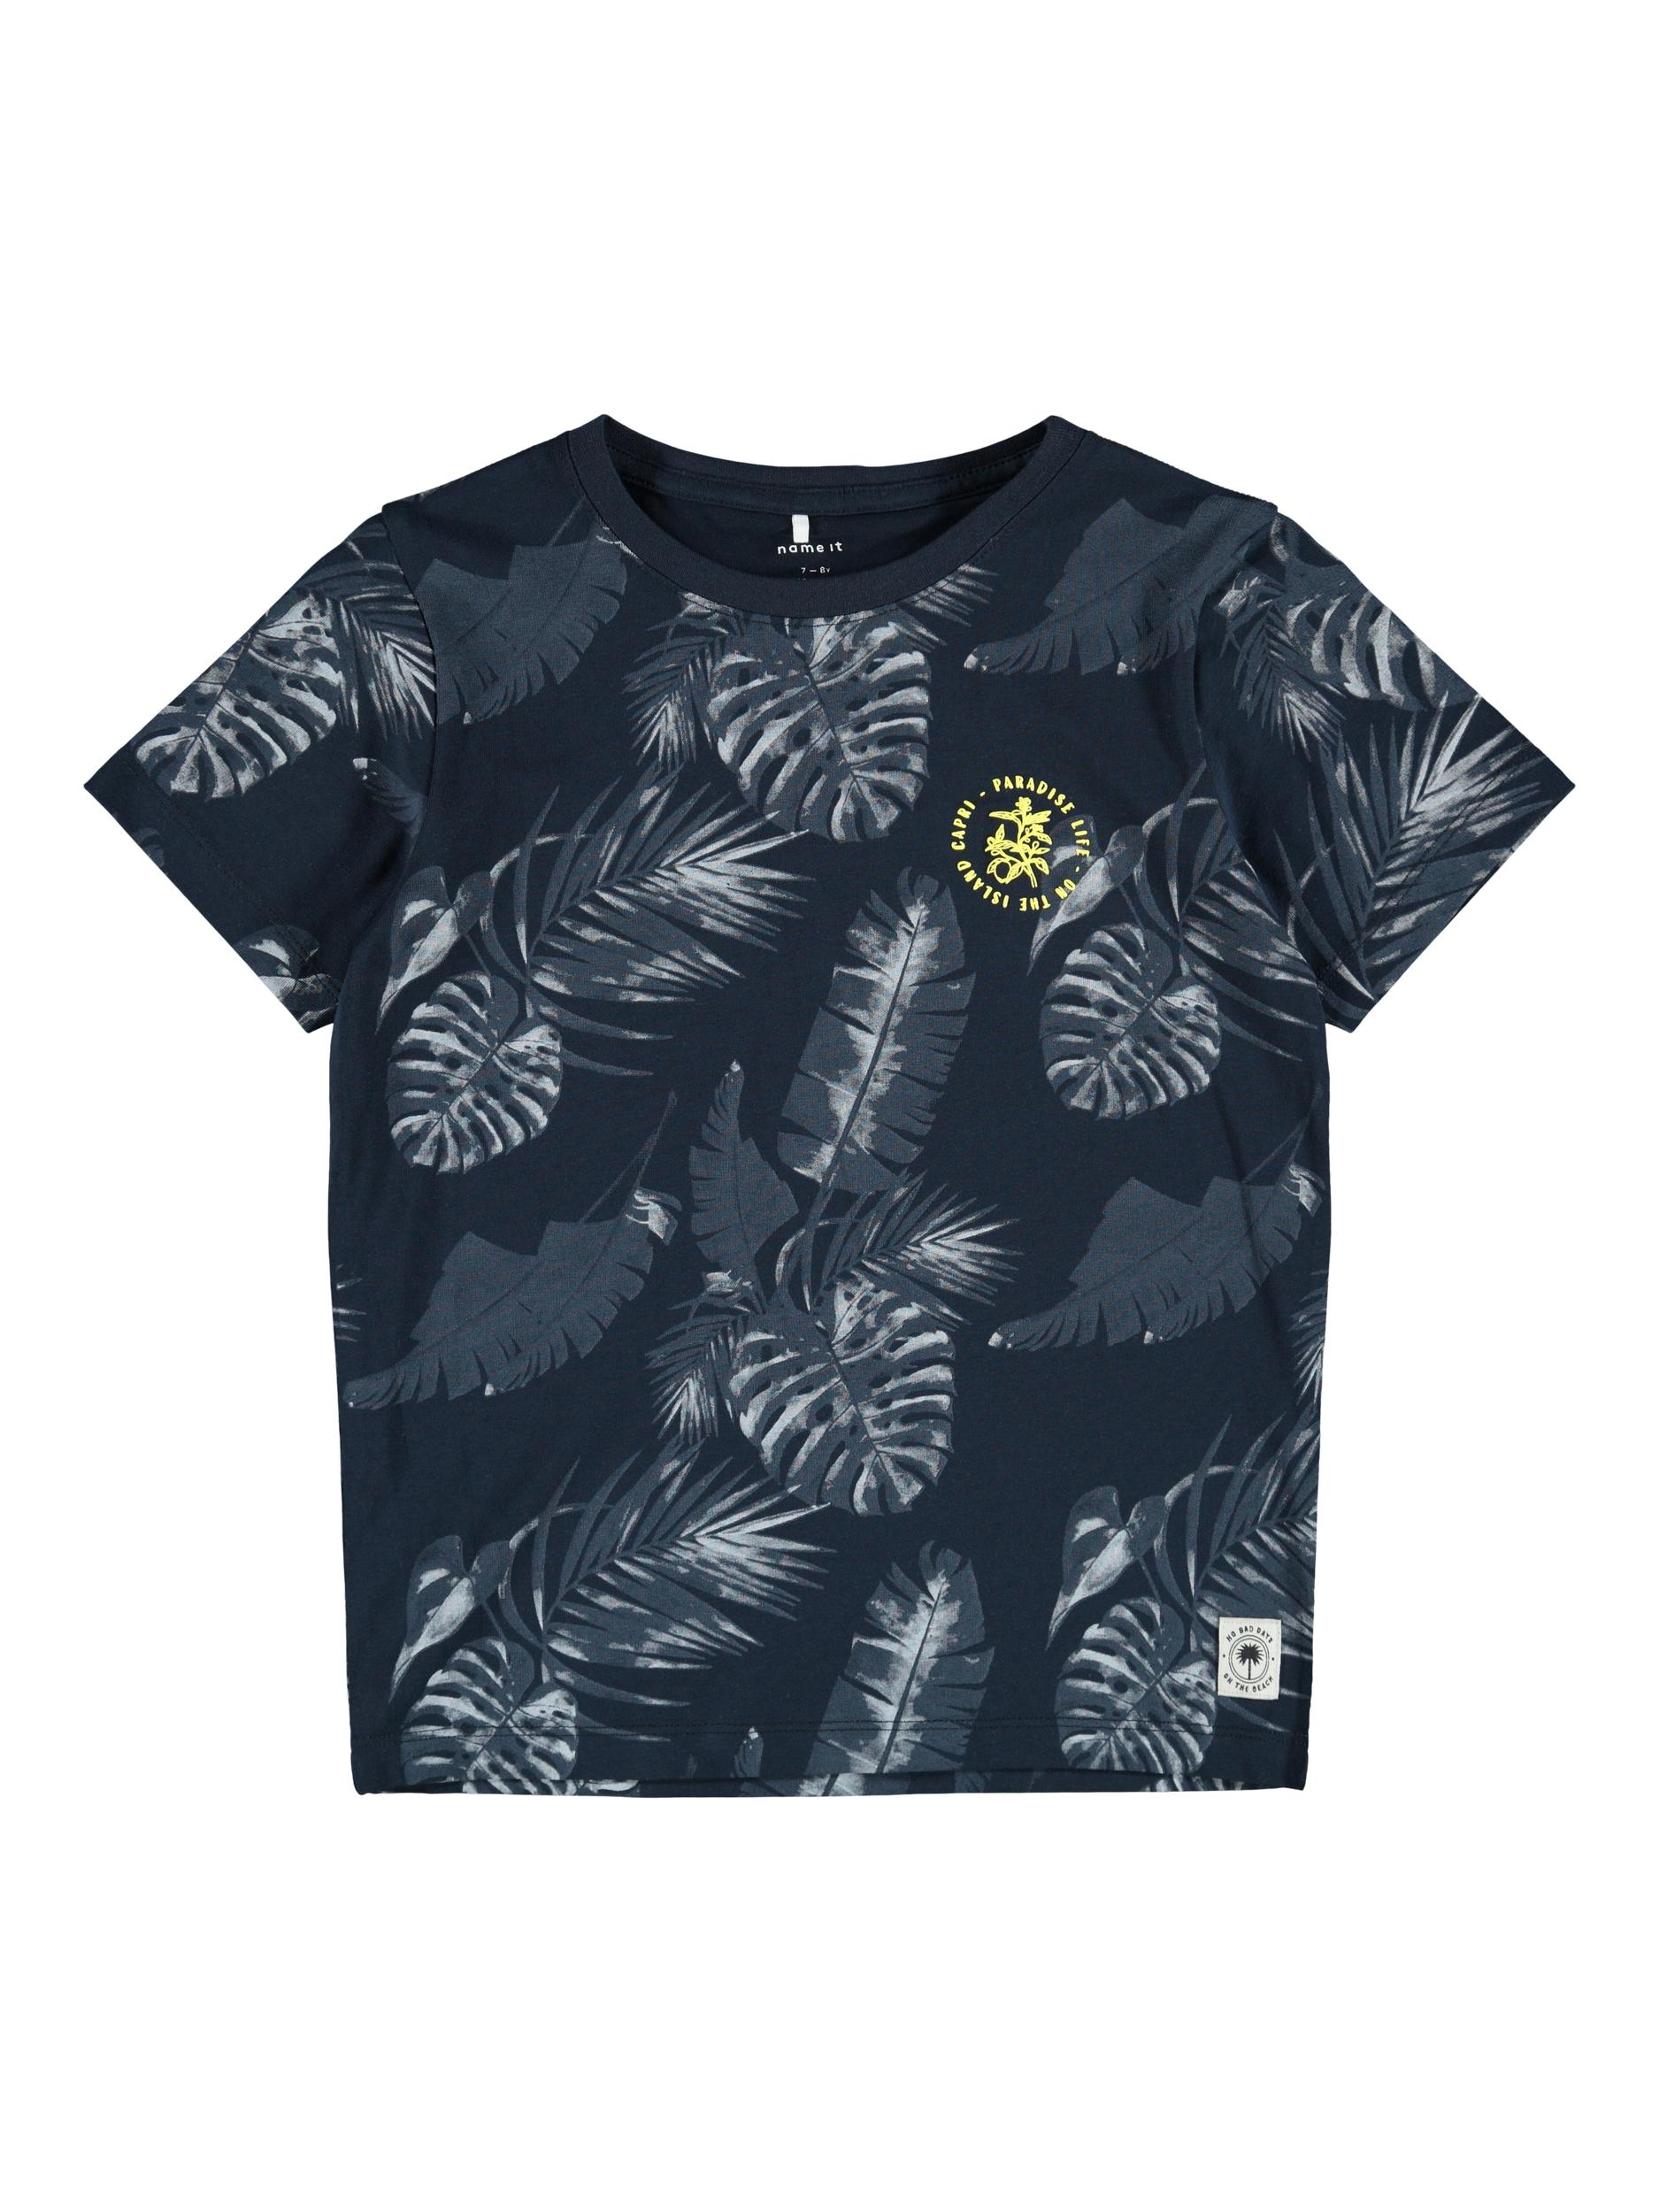 Name It Hachem SS t-shirt